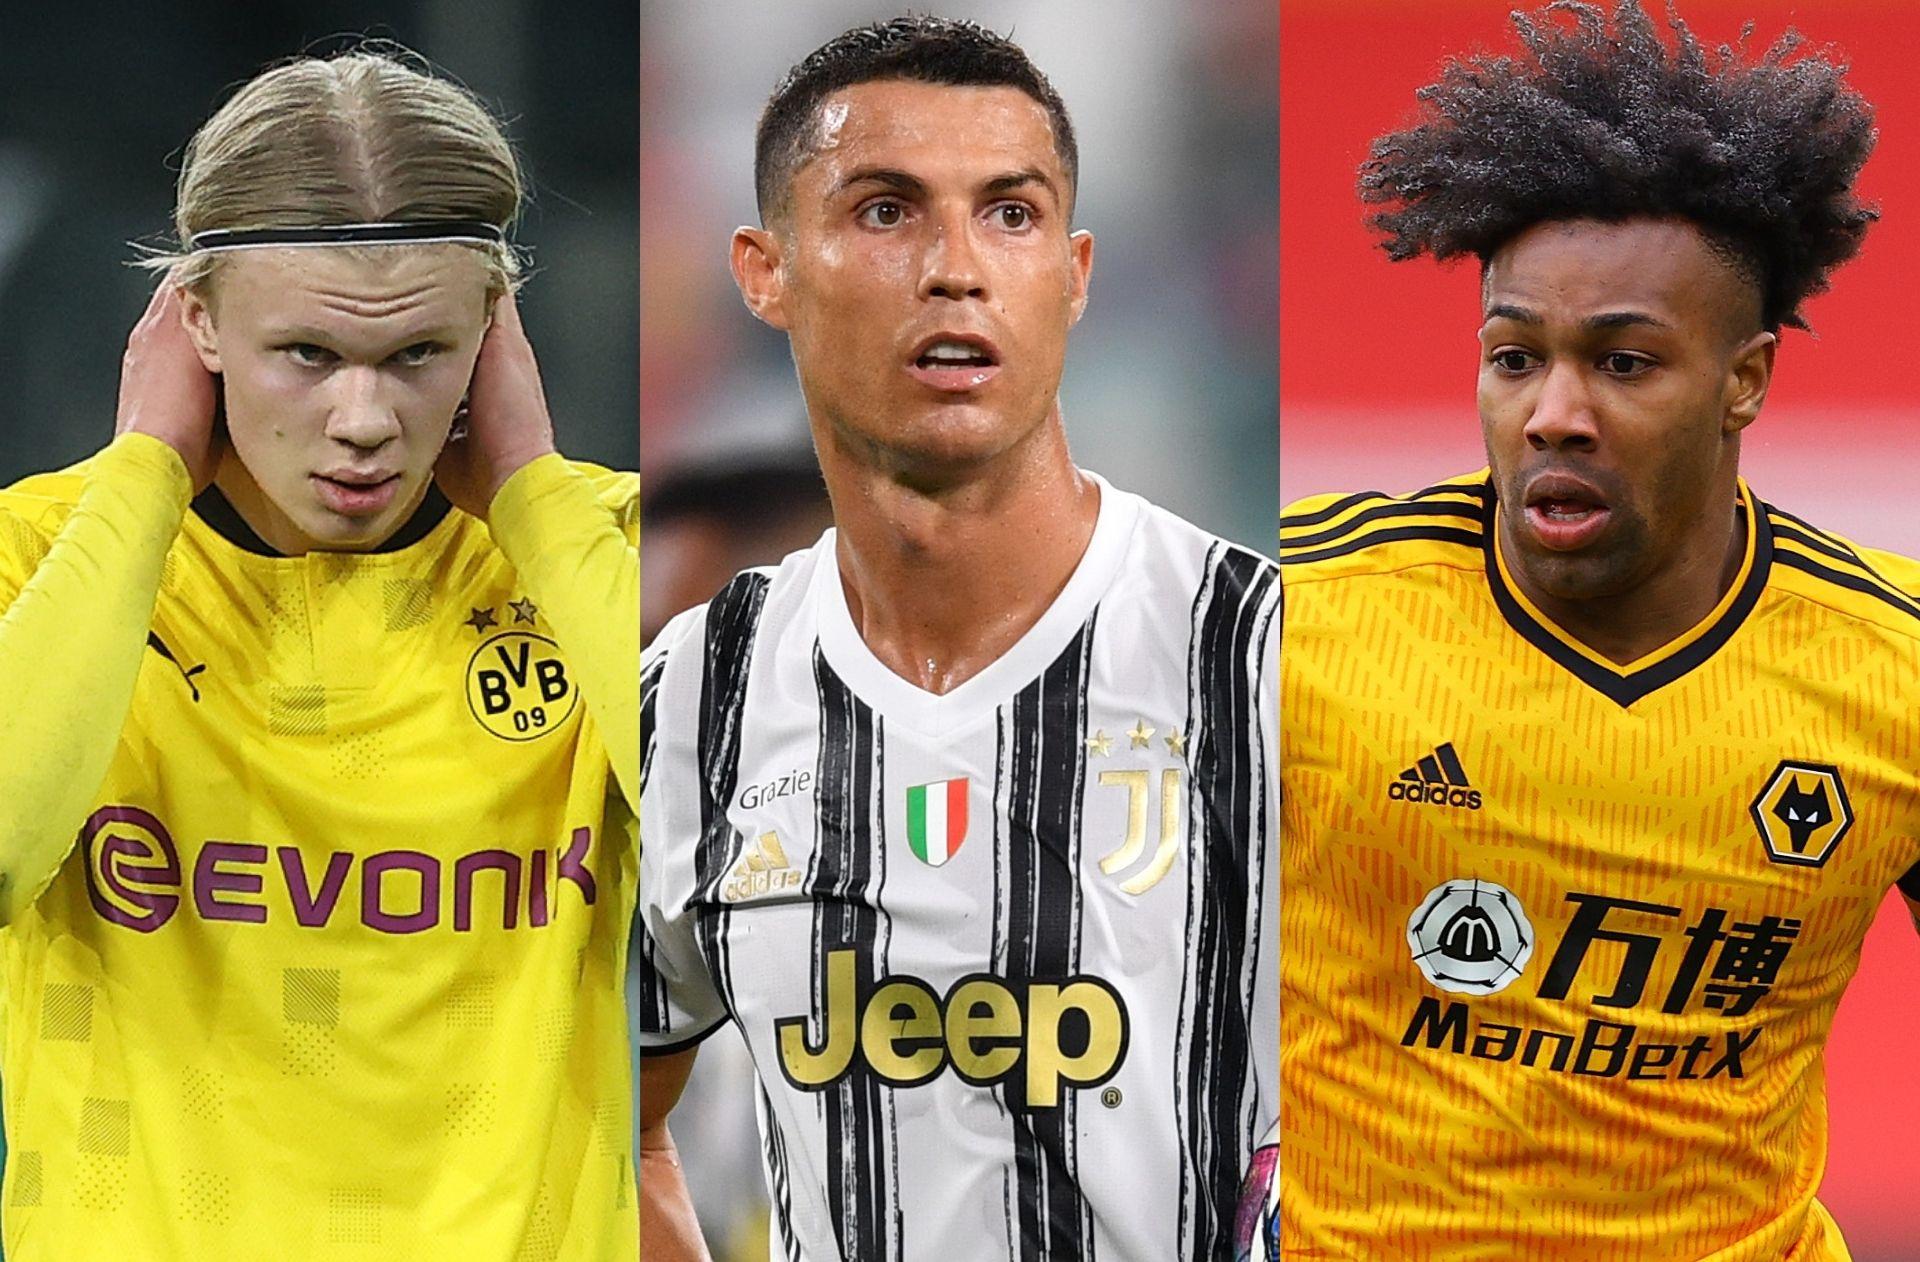 Saturday's transfer rumors - Juventus name a strike partner for Ronaldo